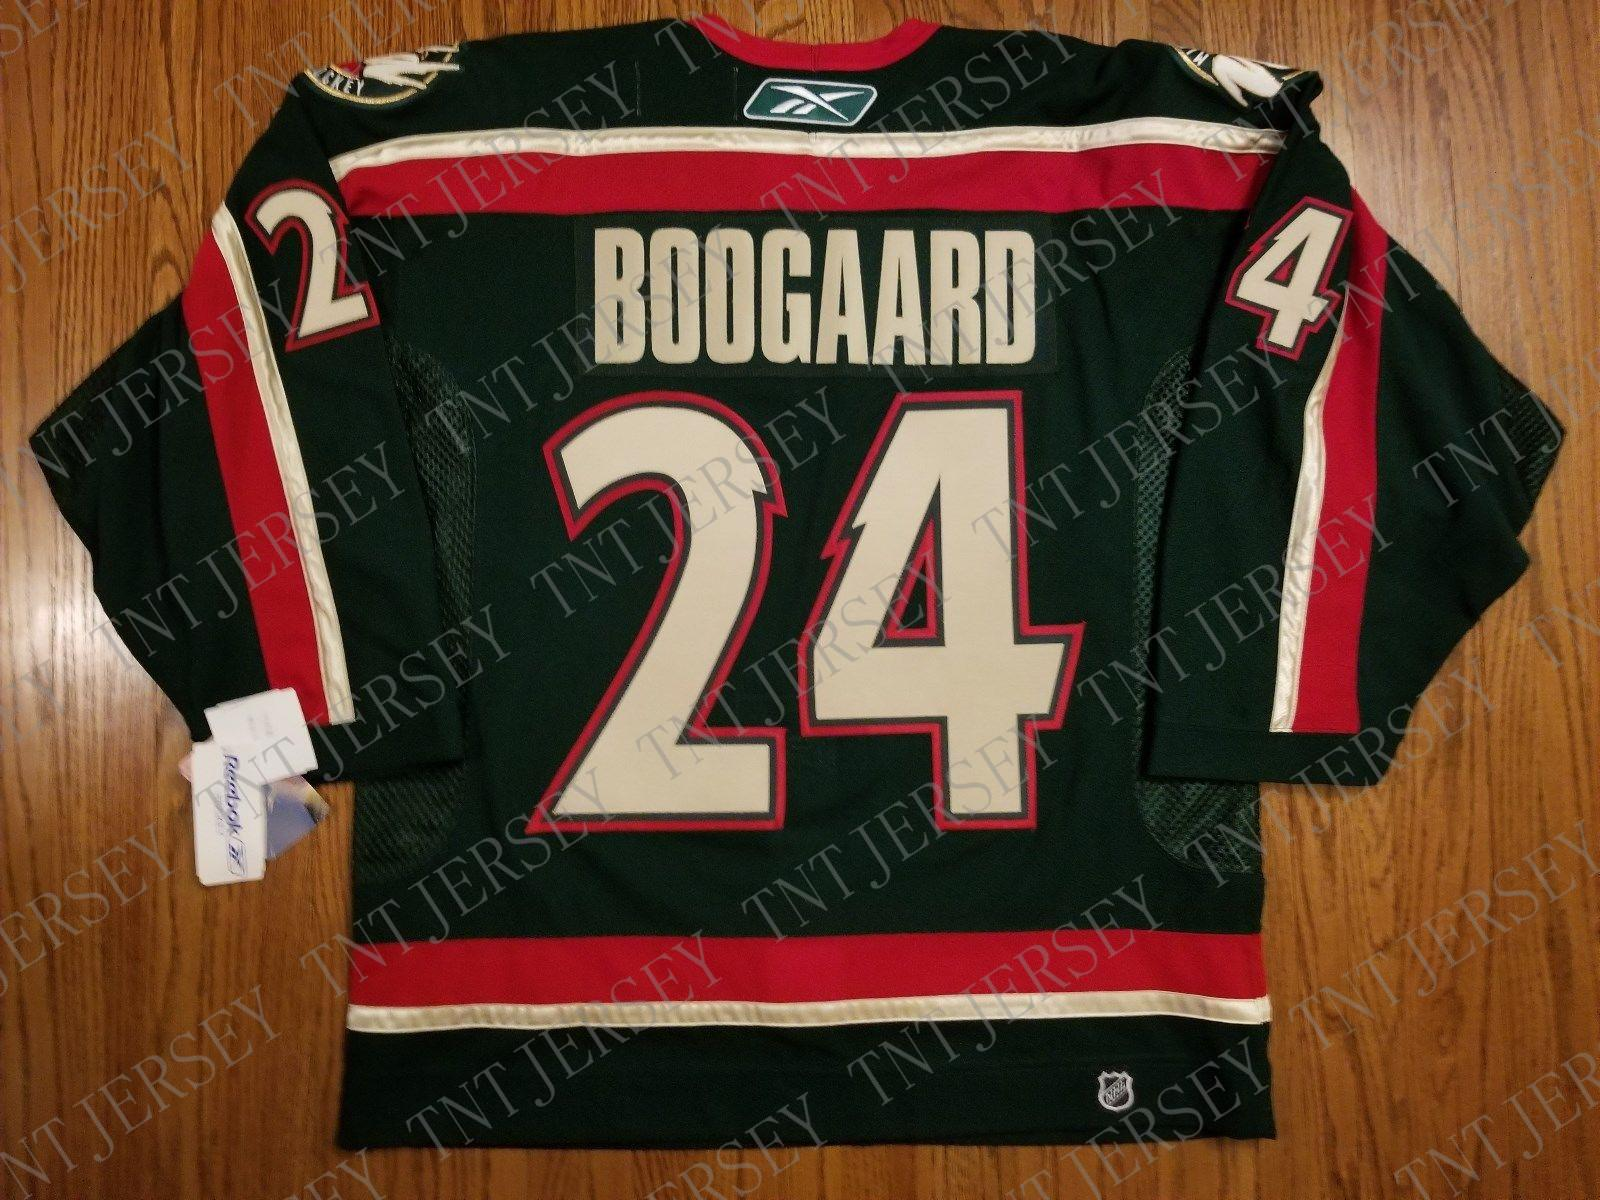 online store 9bd9f 7965d Cheap custom Derek Boogaard Vintage Minnesota Wild 6100 Pro Jersey Stitched  Retro Hockey Jersey XS-5XL